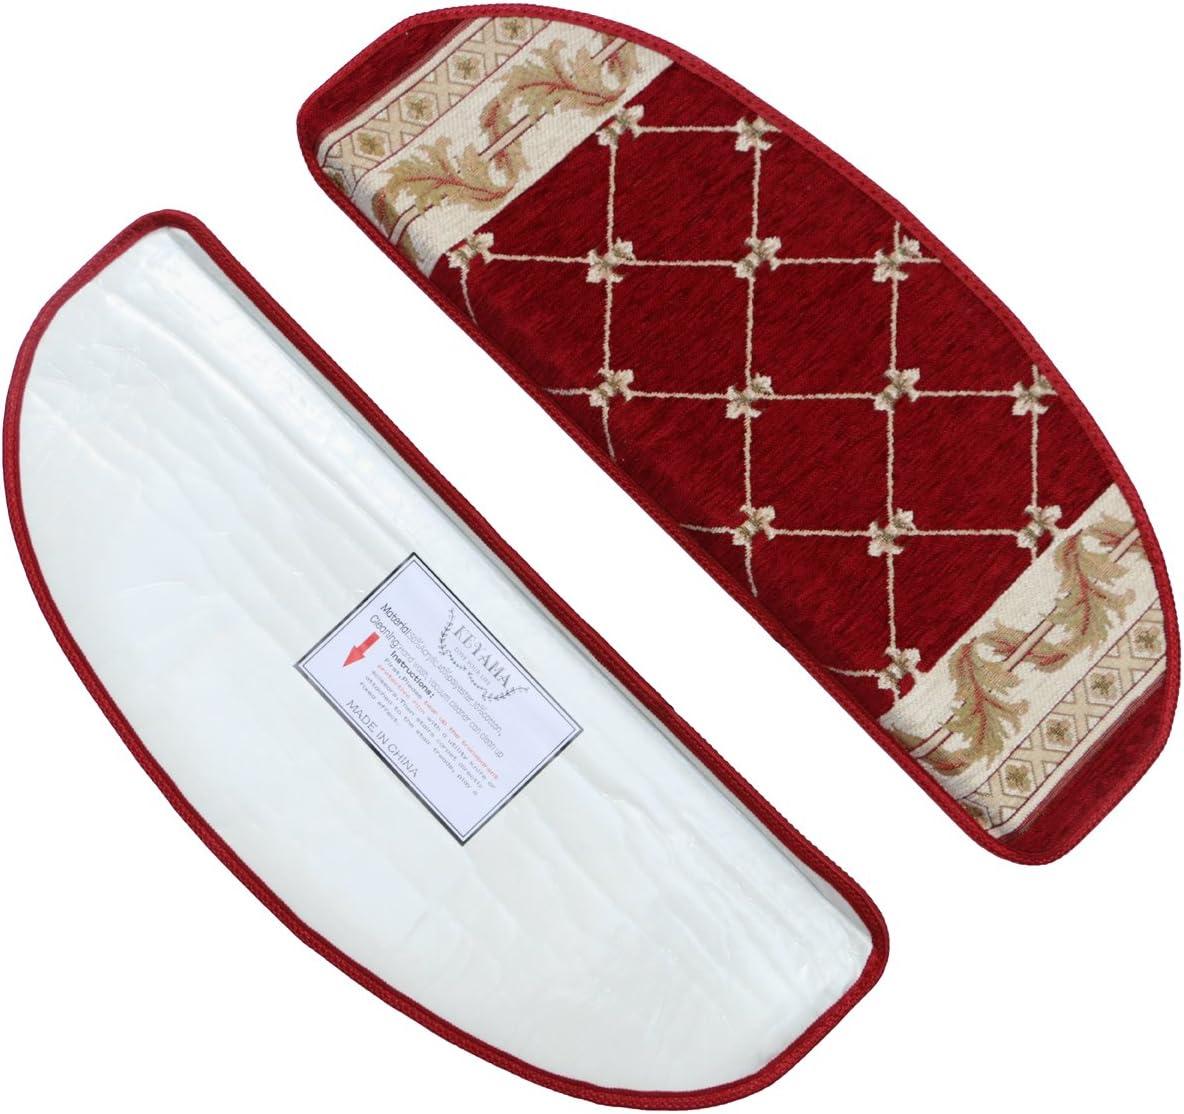 KEYAMA 1 Piece Acrylic High-Grade Sector Bullnose Manufacturer direct delivery Under blast sales Grid Carpet St